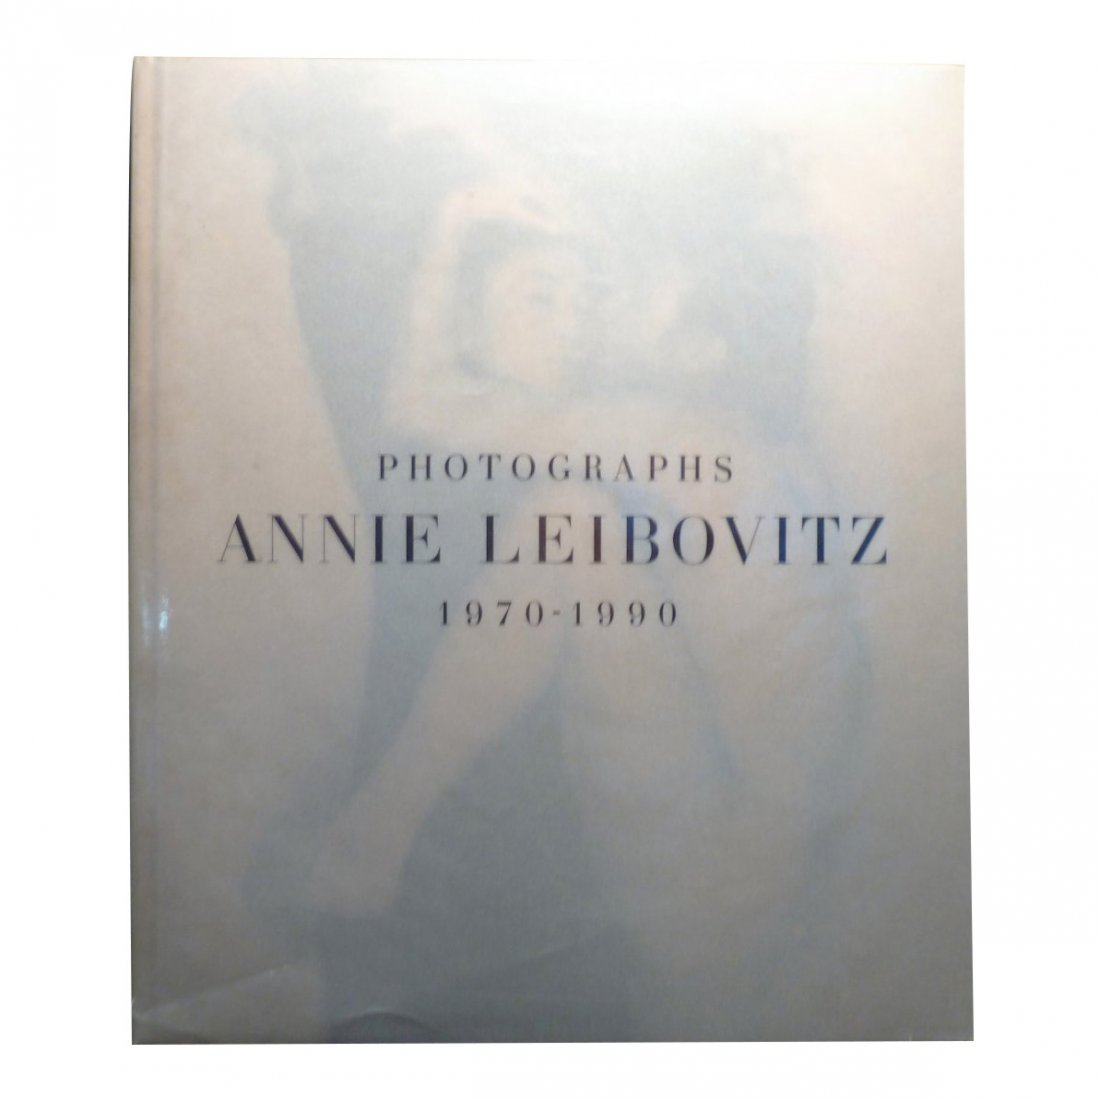 Annie Leibovitz: Photographs, 1970-1990 - Signed